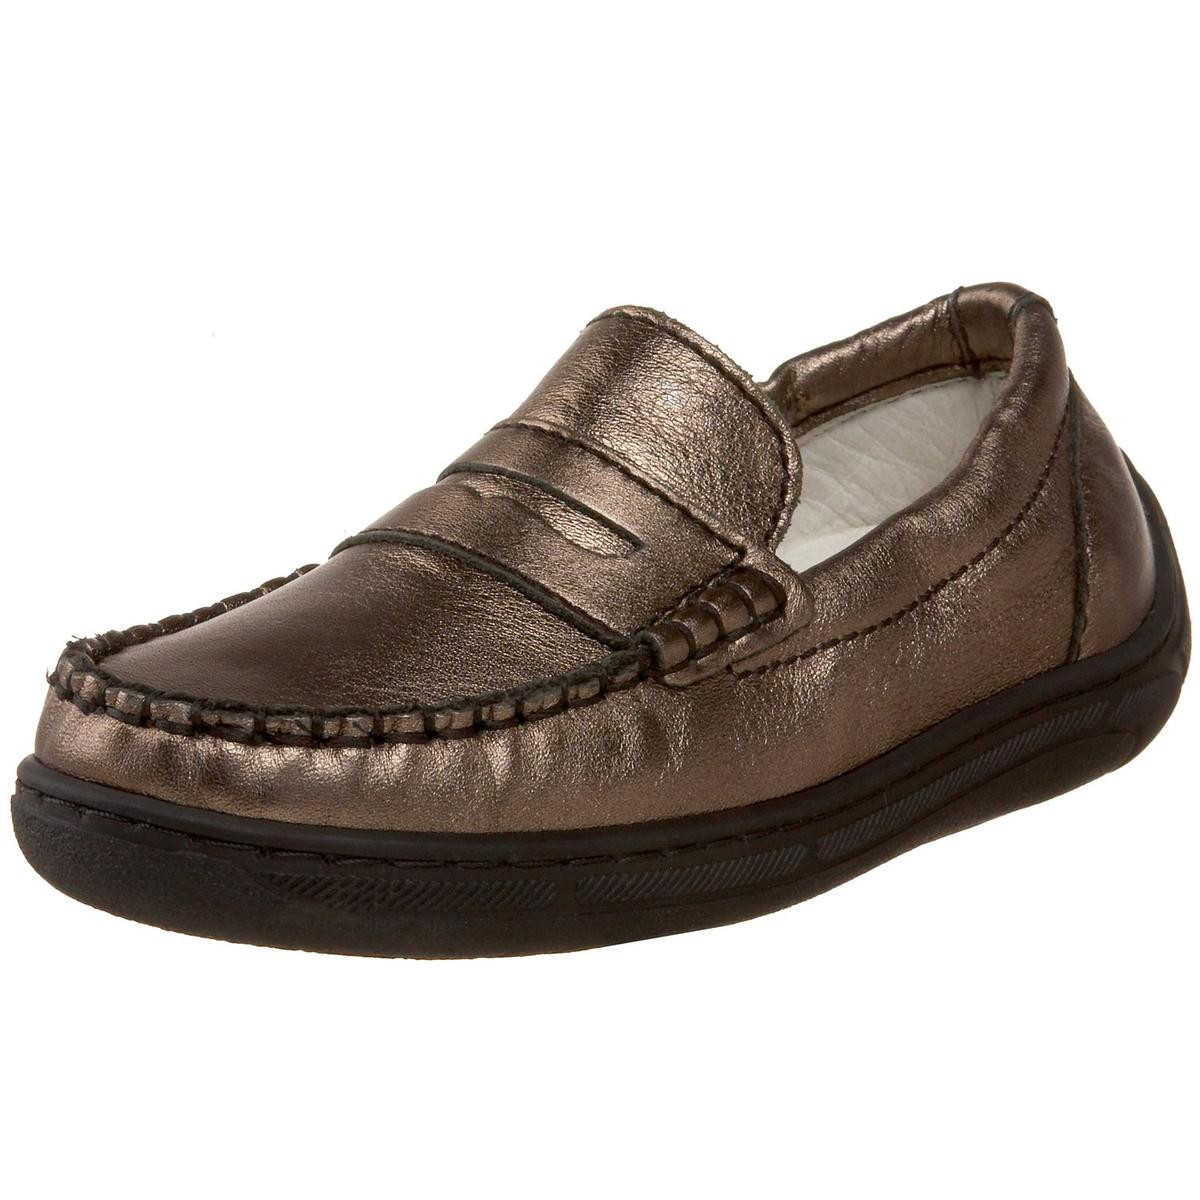 Primigi Unisex Kid's Choate-E Fango Metallic Leather Loafers by Primigi